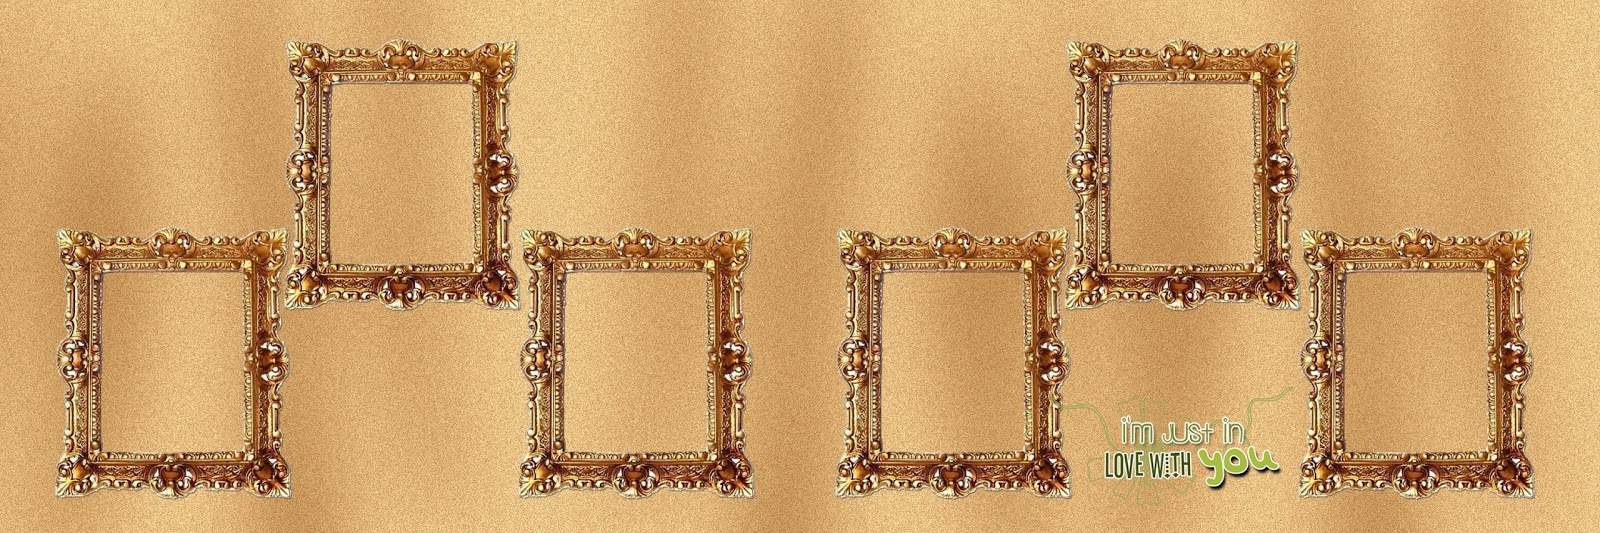 12X36 Wedding Album Designs